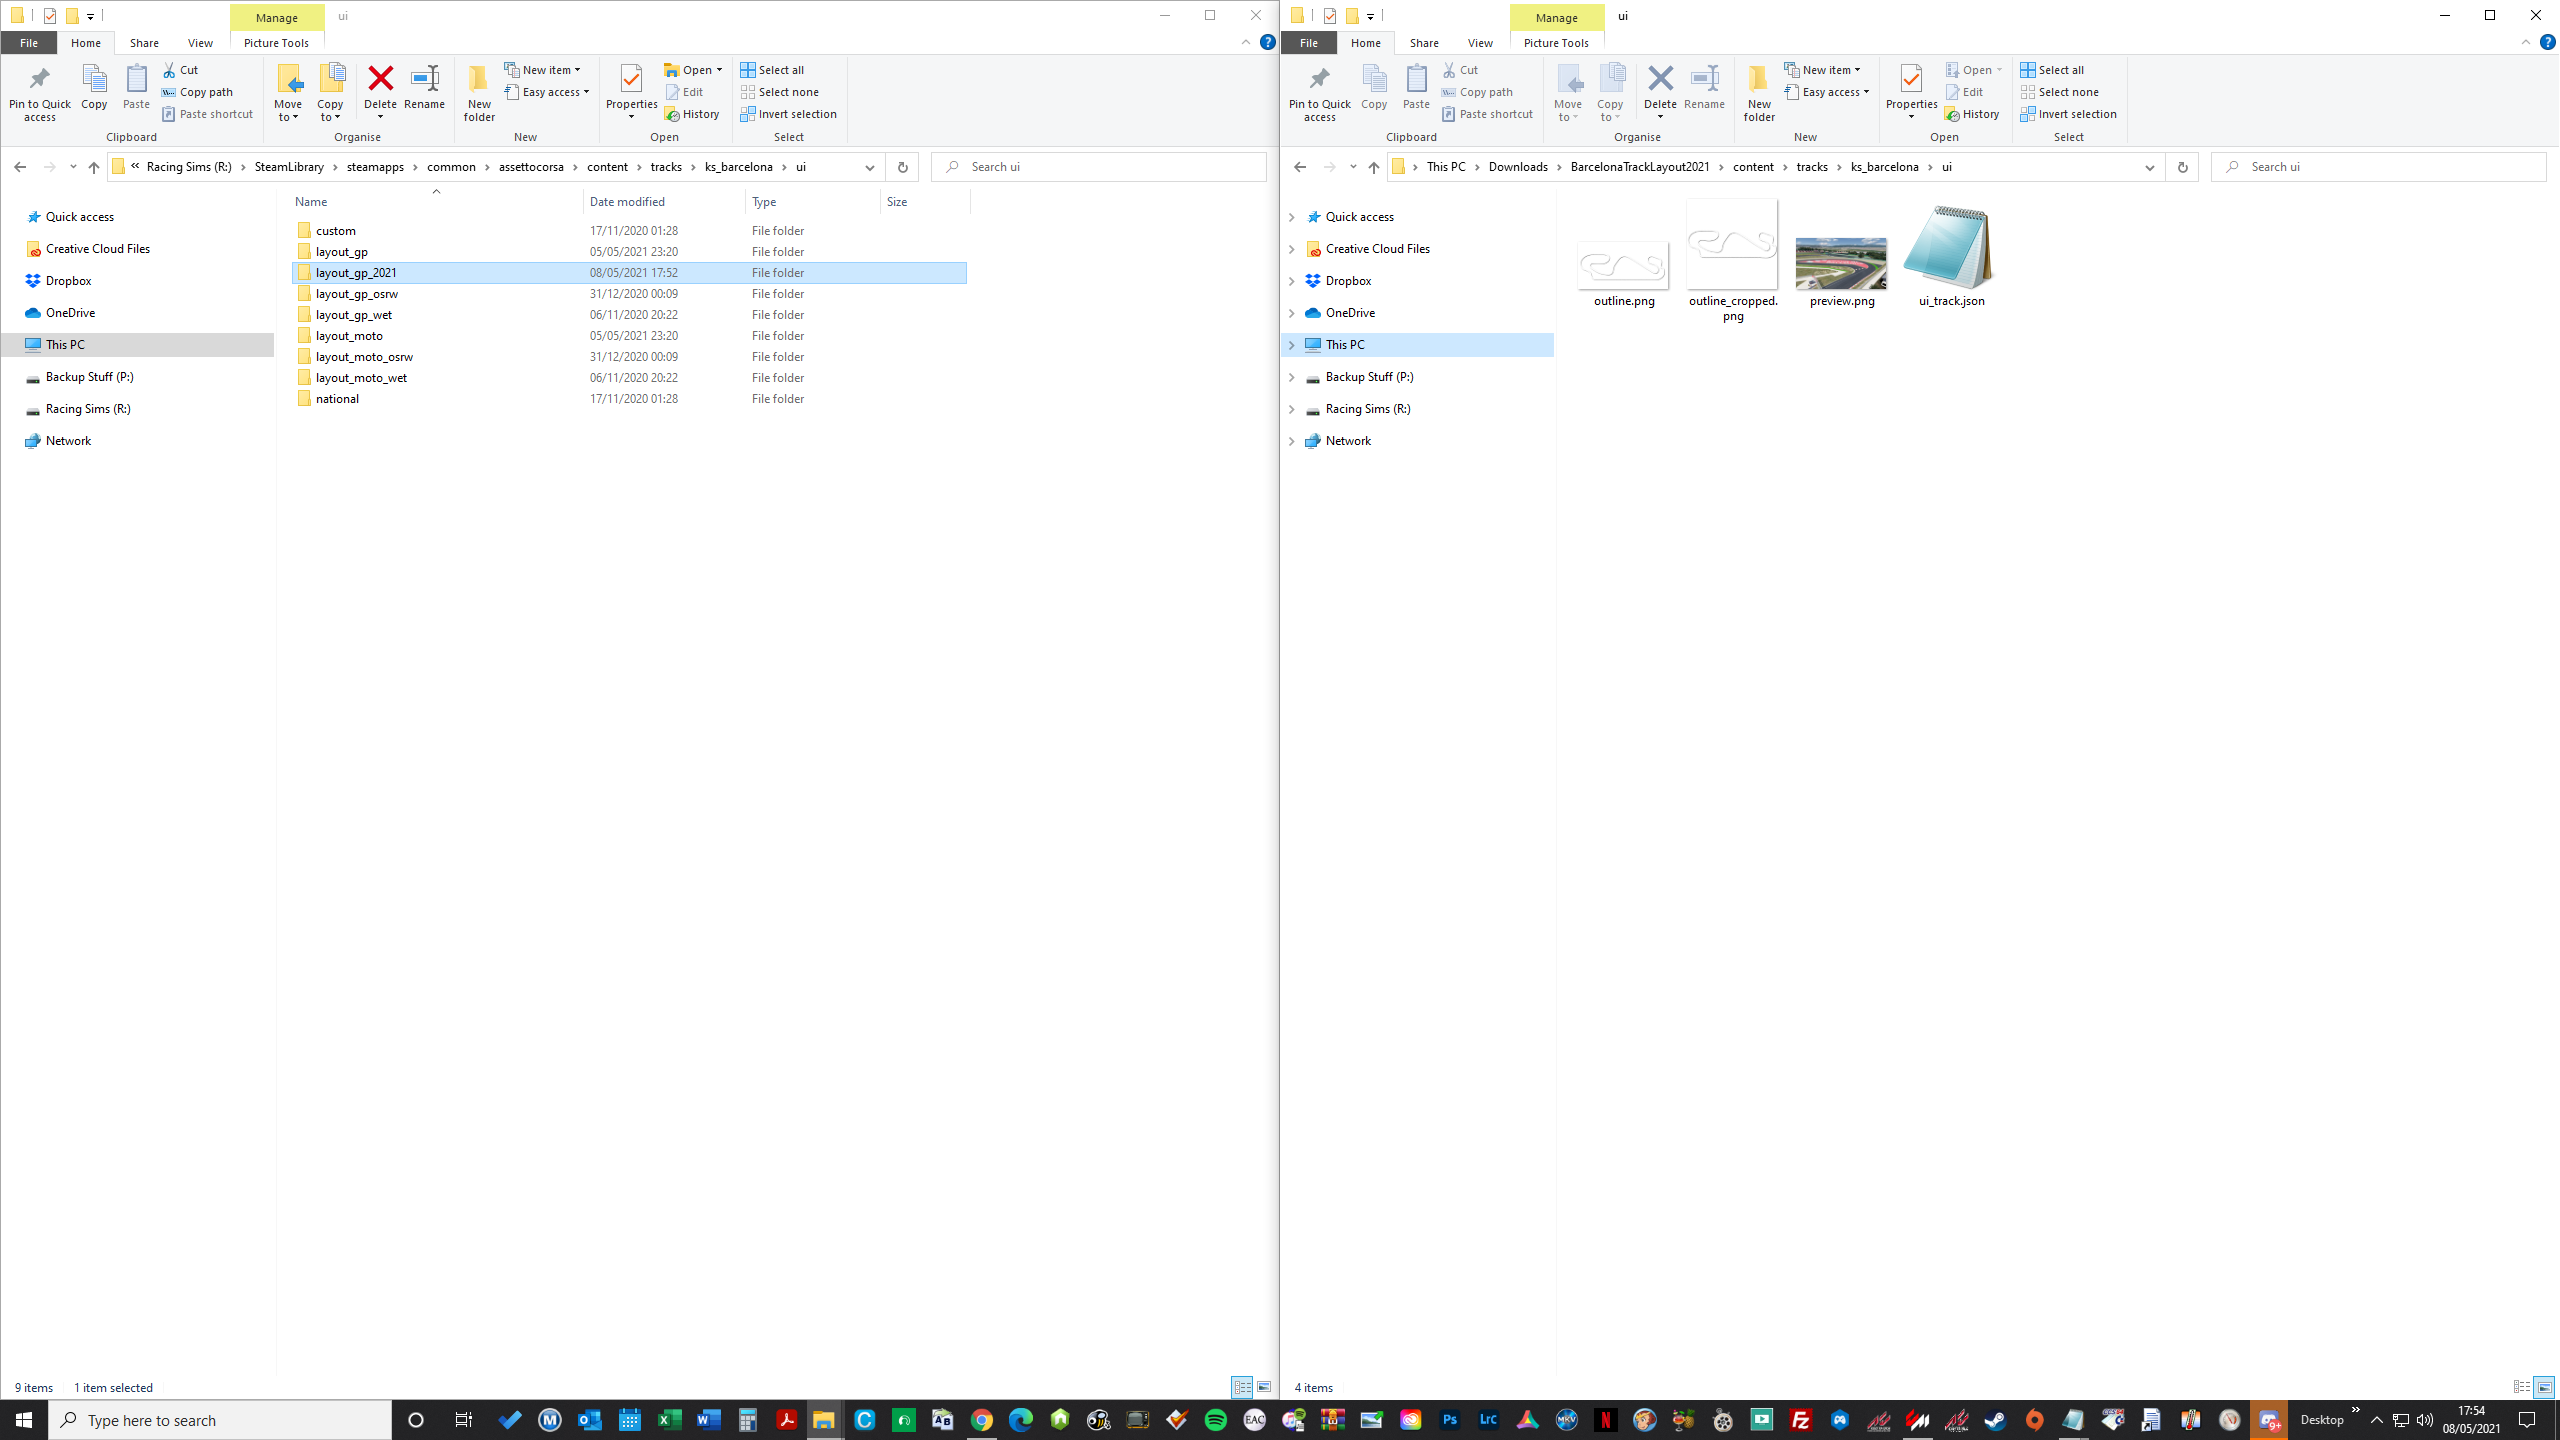 Screenshot (601).png